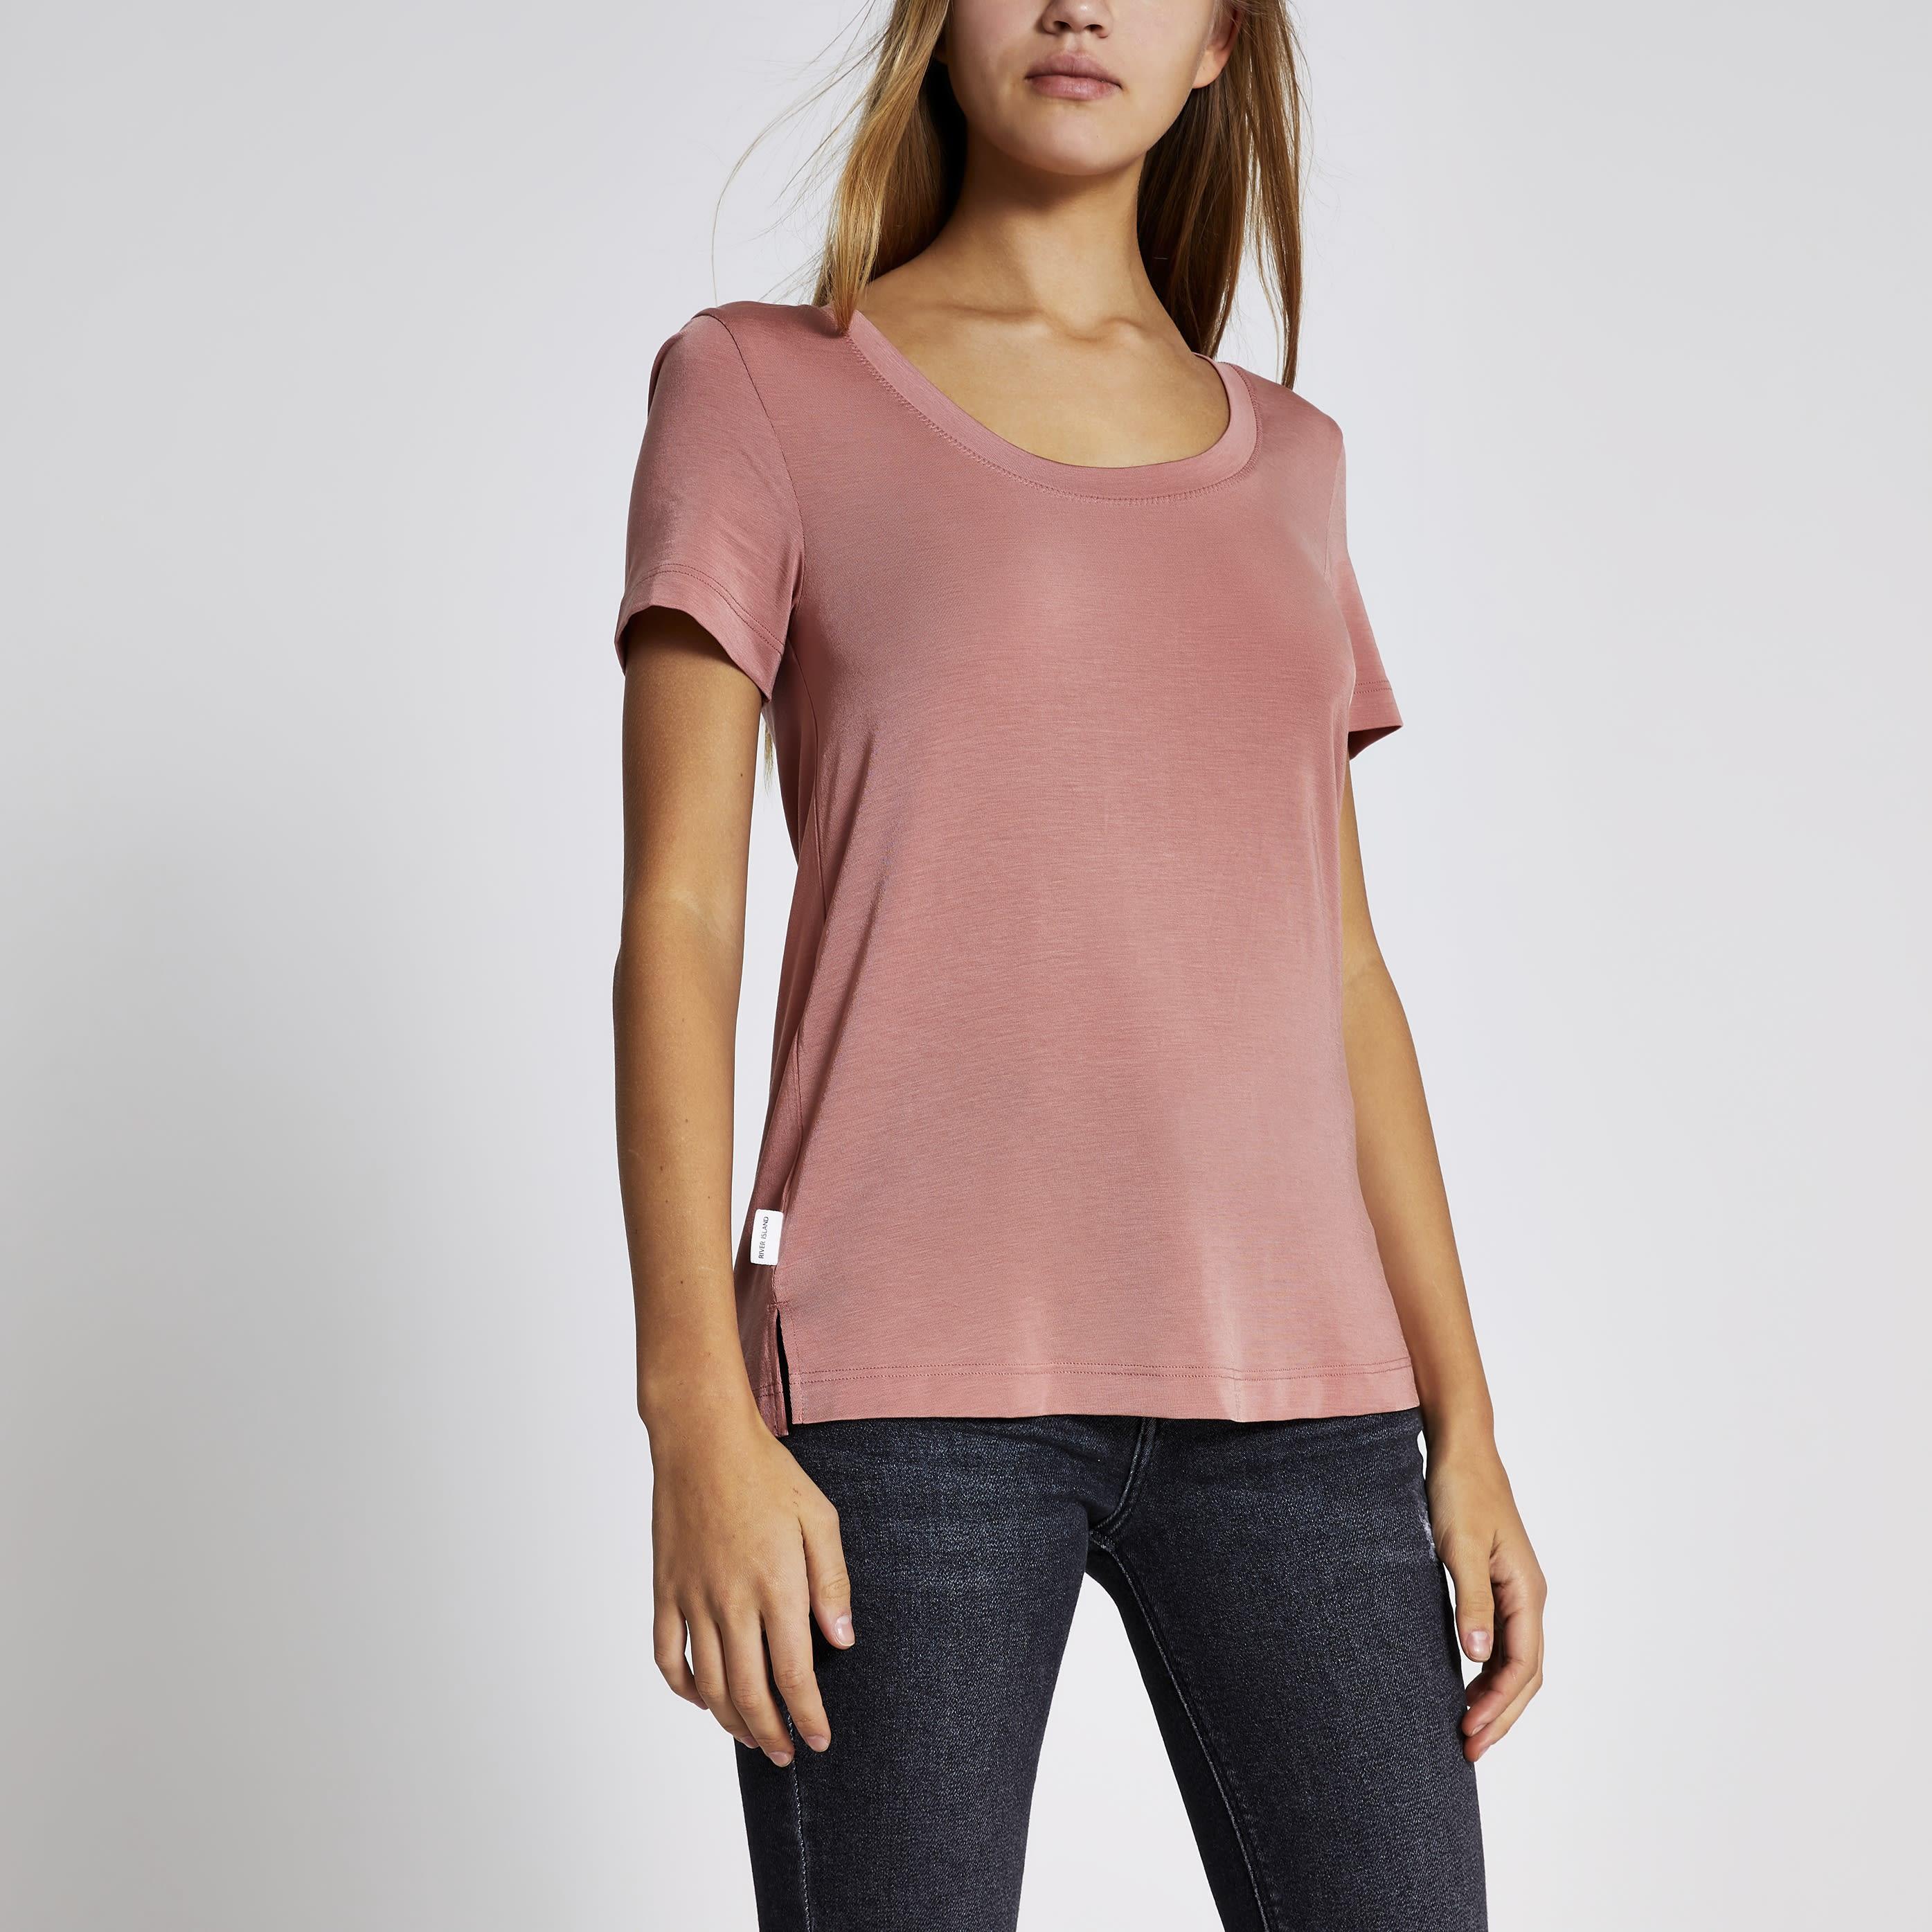 River Island Womens Pink premium jersey scoop neck T-shirt (12)